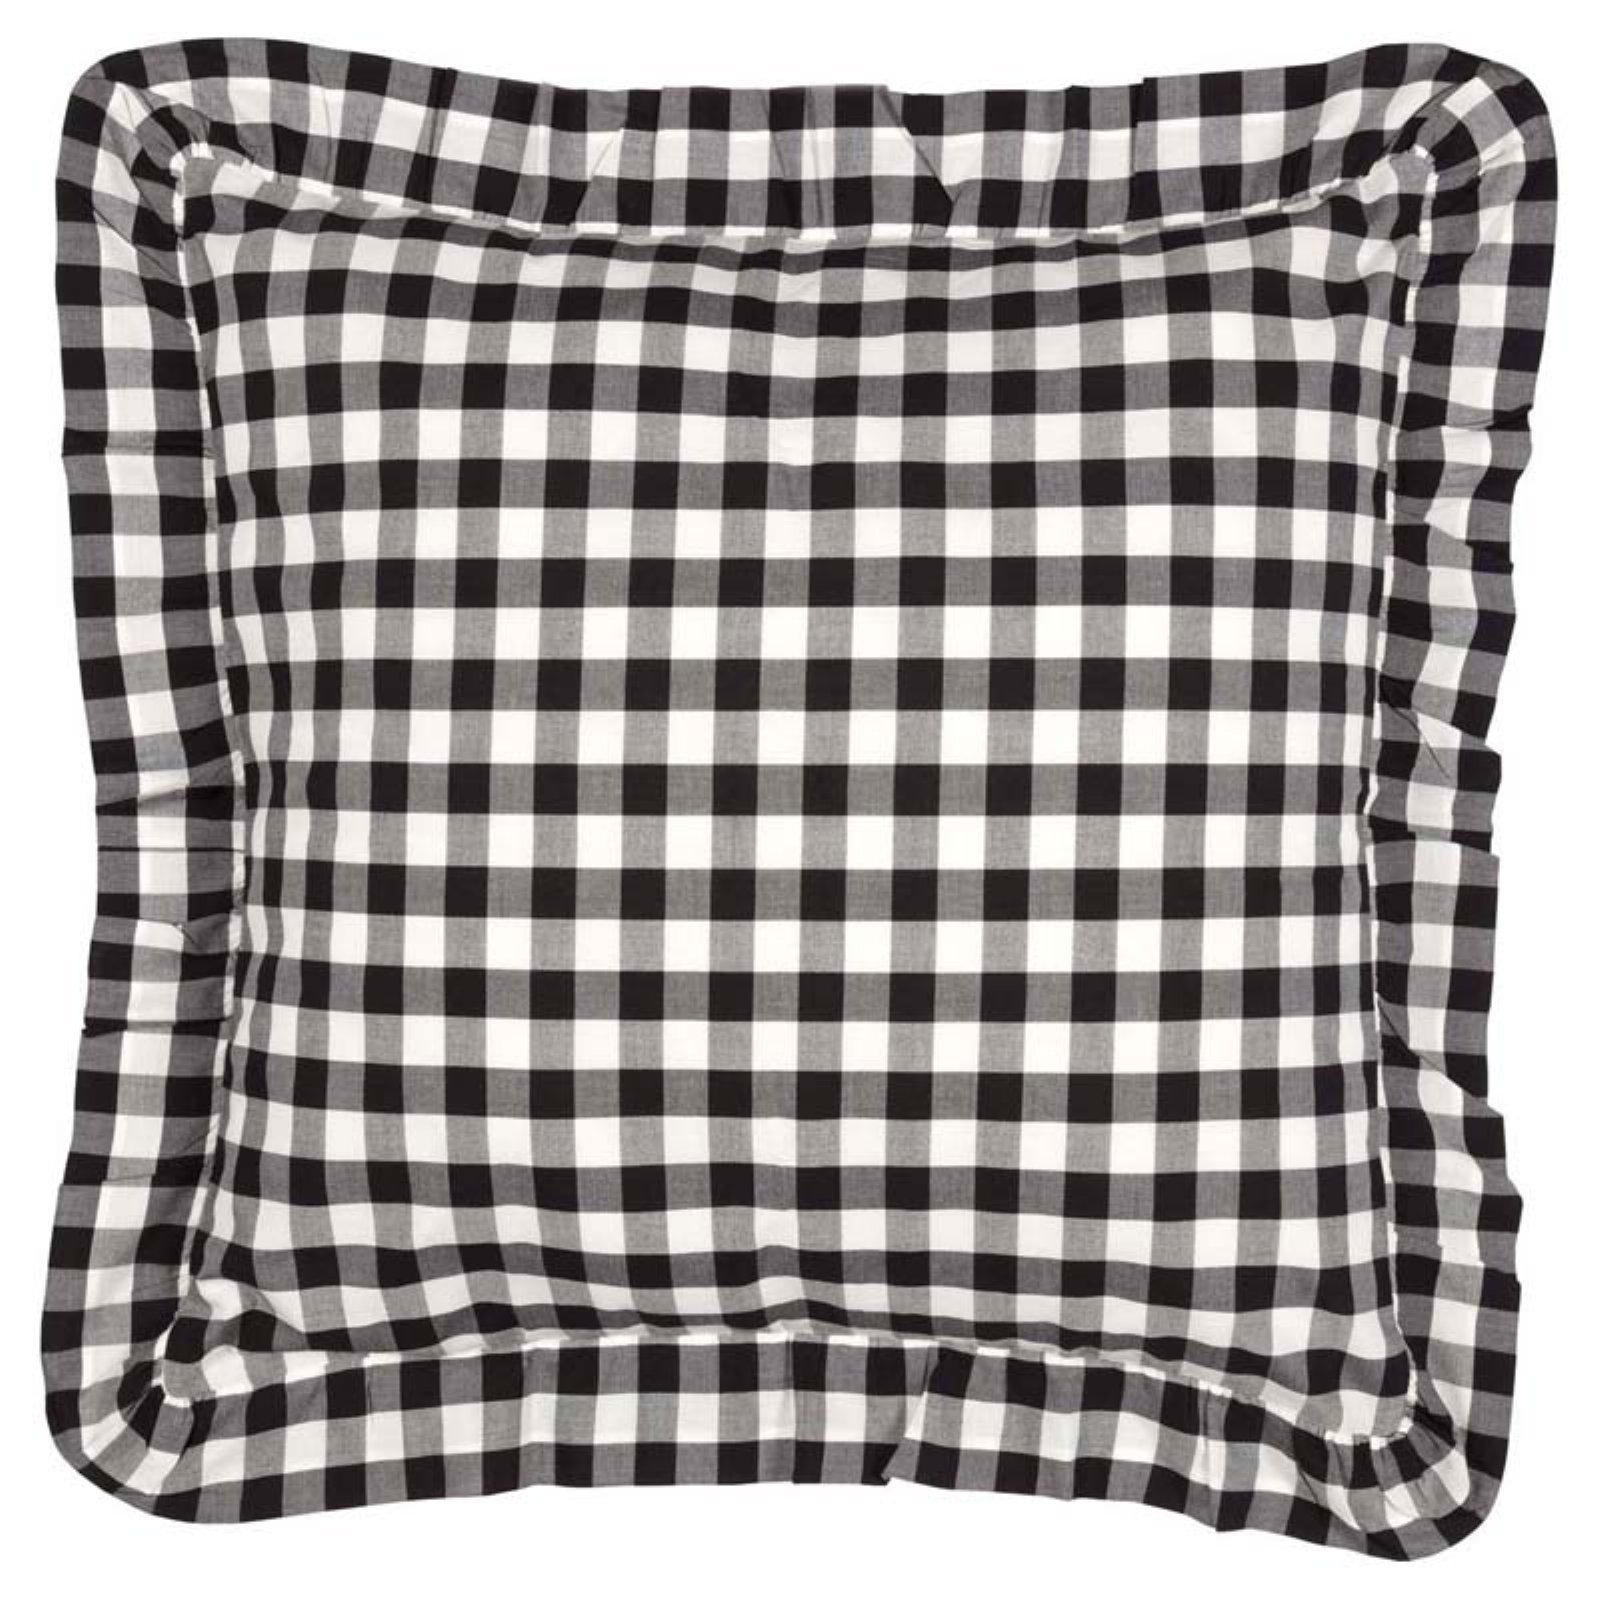 Annie Buffalo Check Fabric Euro Sham By Vhc Brands Black Buffalo Check Fabric Check Fabric Buffalo Check